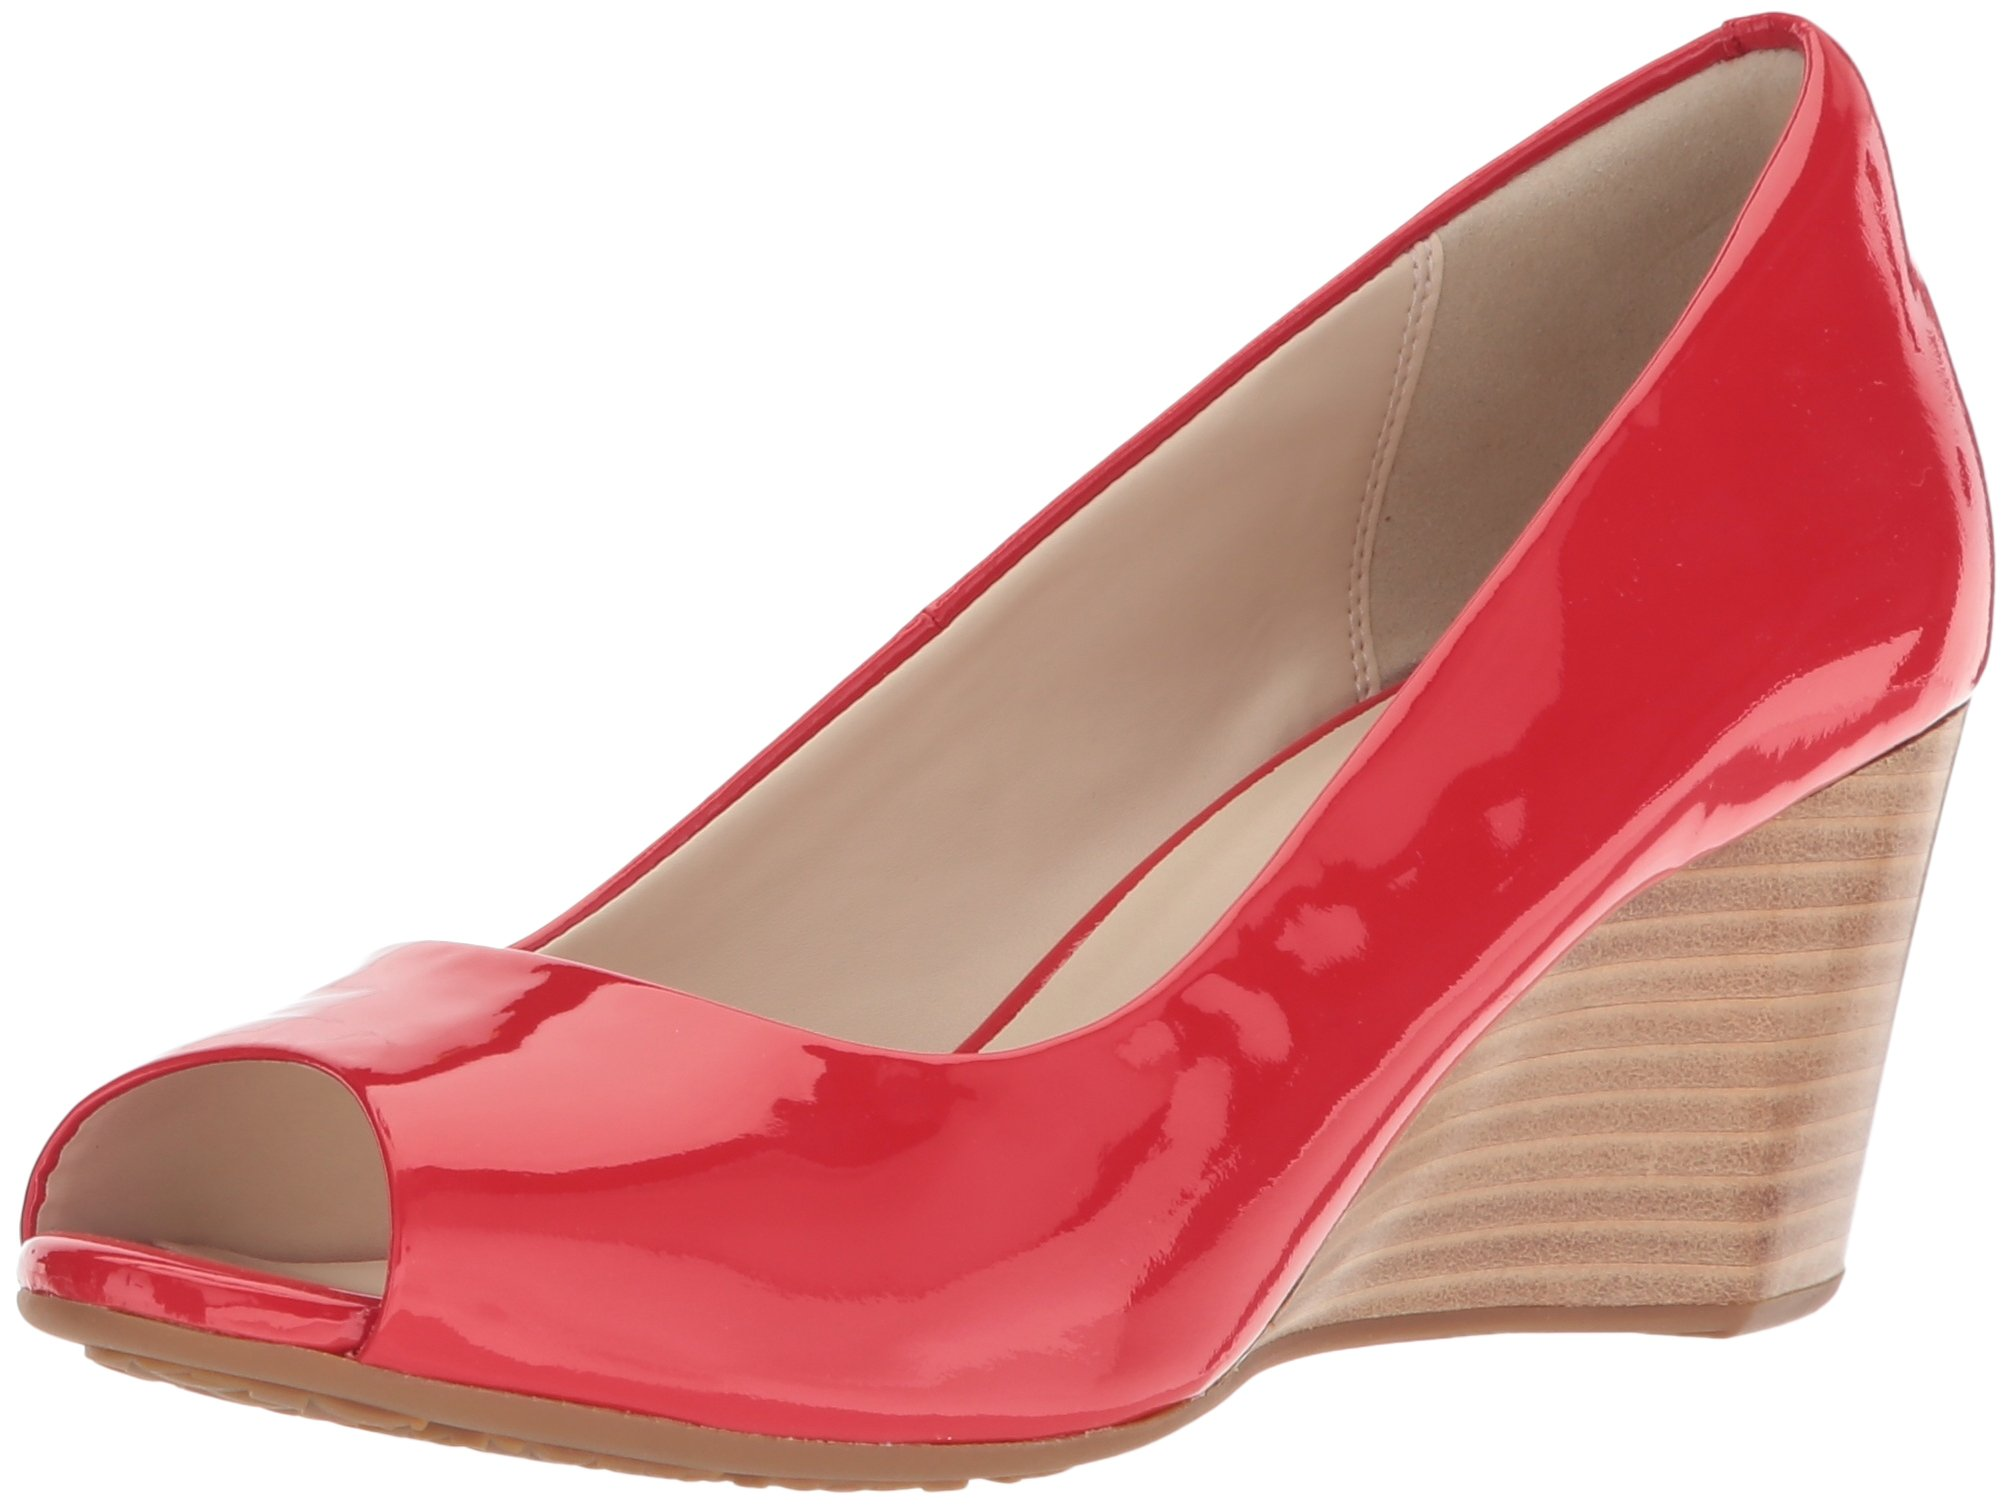 Cole Haan Women's Sadie Open Toe Wedge 65MM Pump, Aura Orange Patent, 7.5 B US